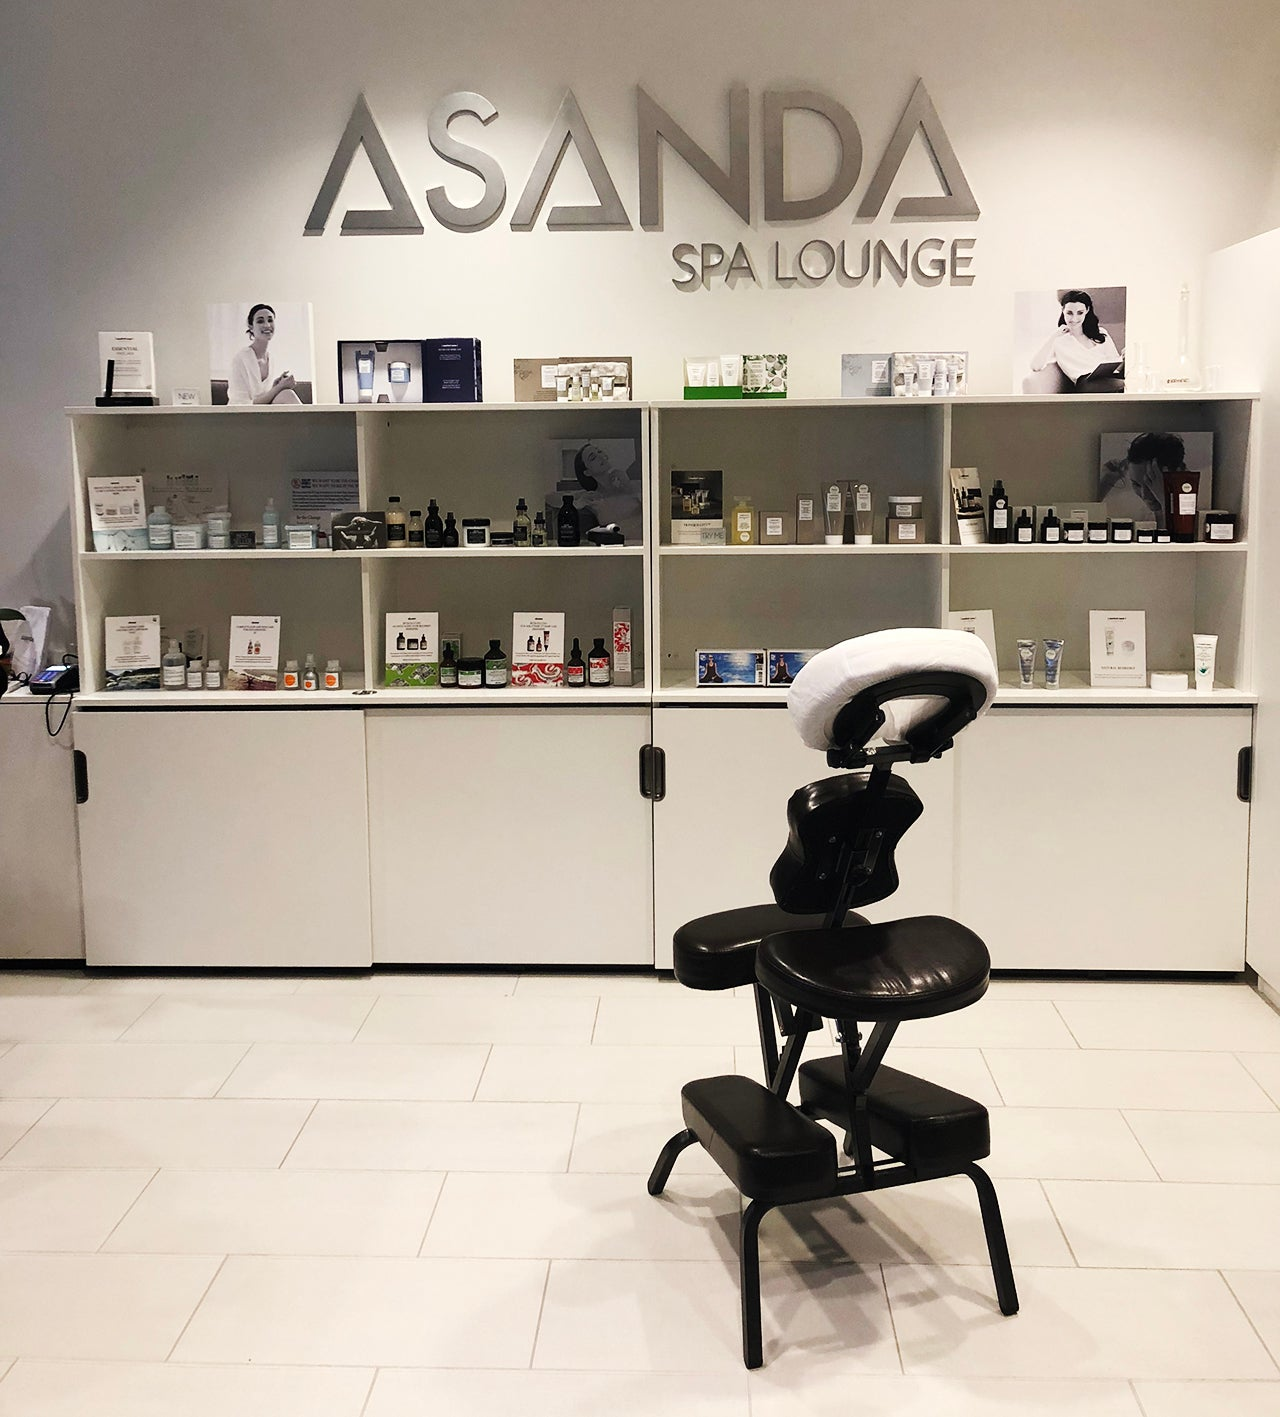 A review of delta 39 s new asanda spa at atlanta airport for Salon lounge